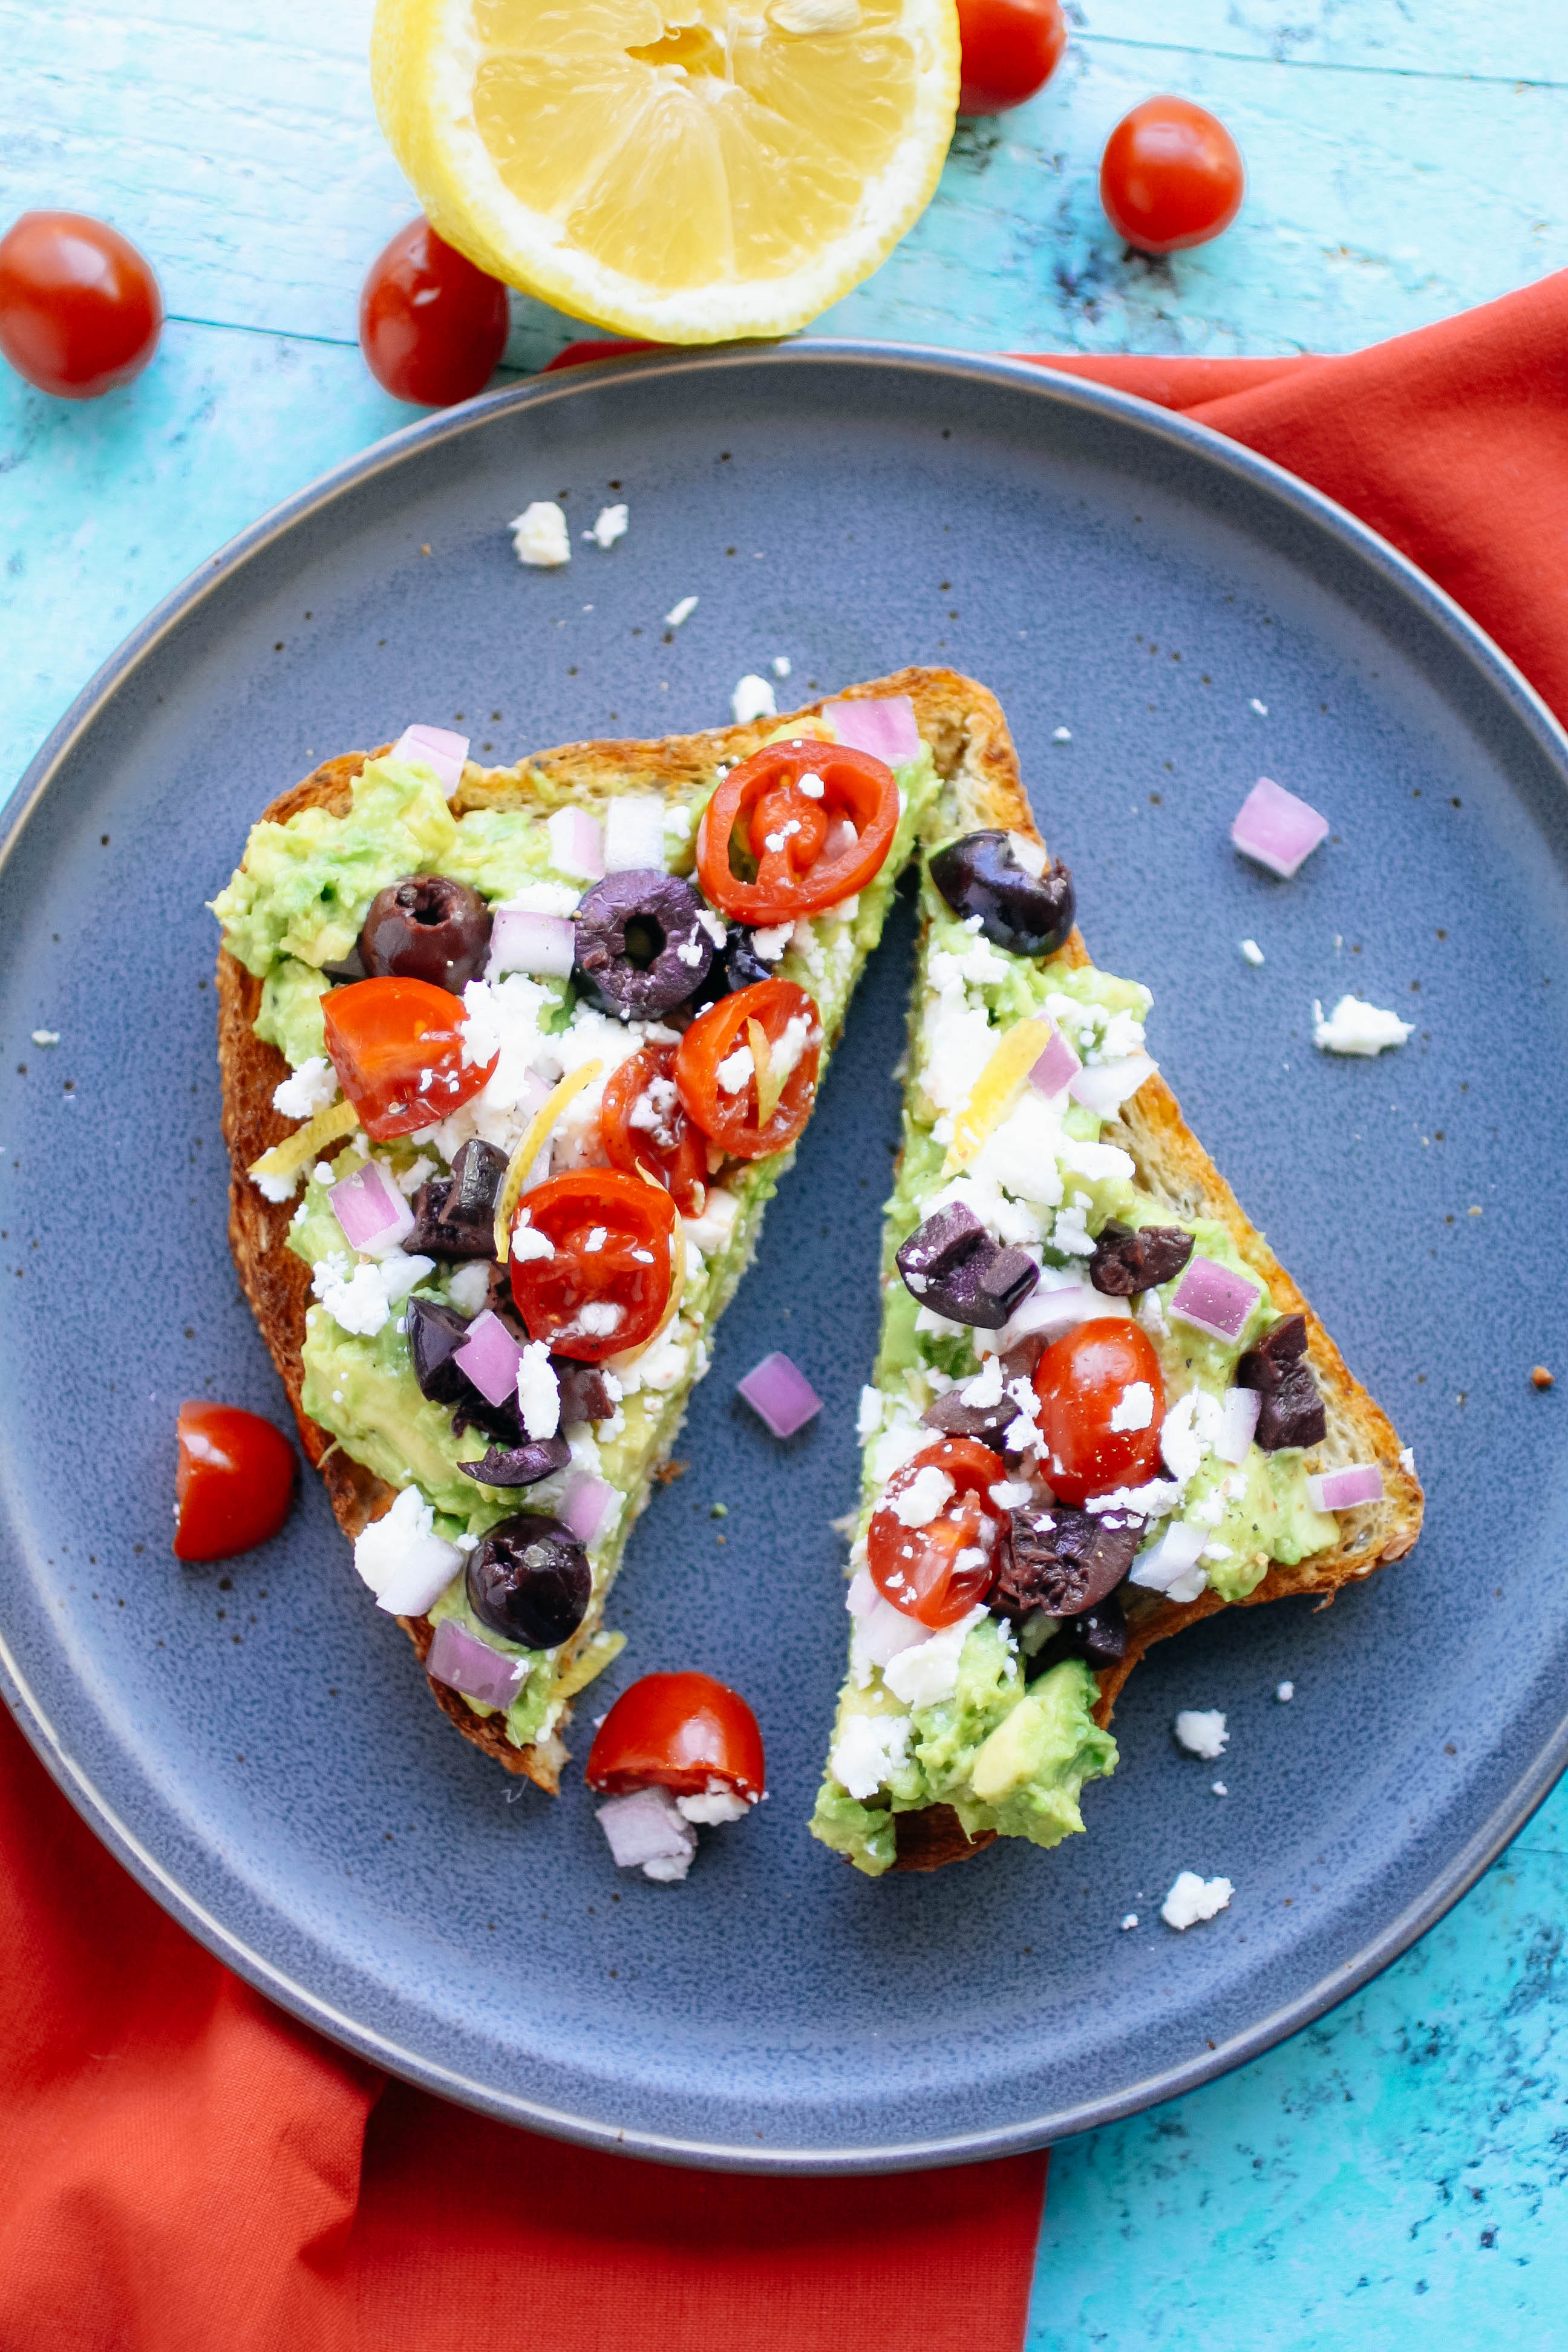 Greek-Style Avocado Toast is a tasty sandwich you'll love. Greek-Style Avocado Toast is a sandwich you'll love!